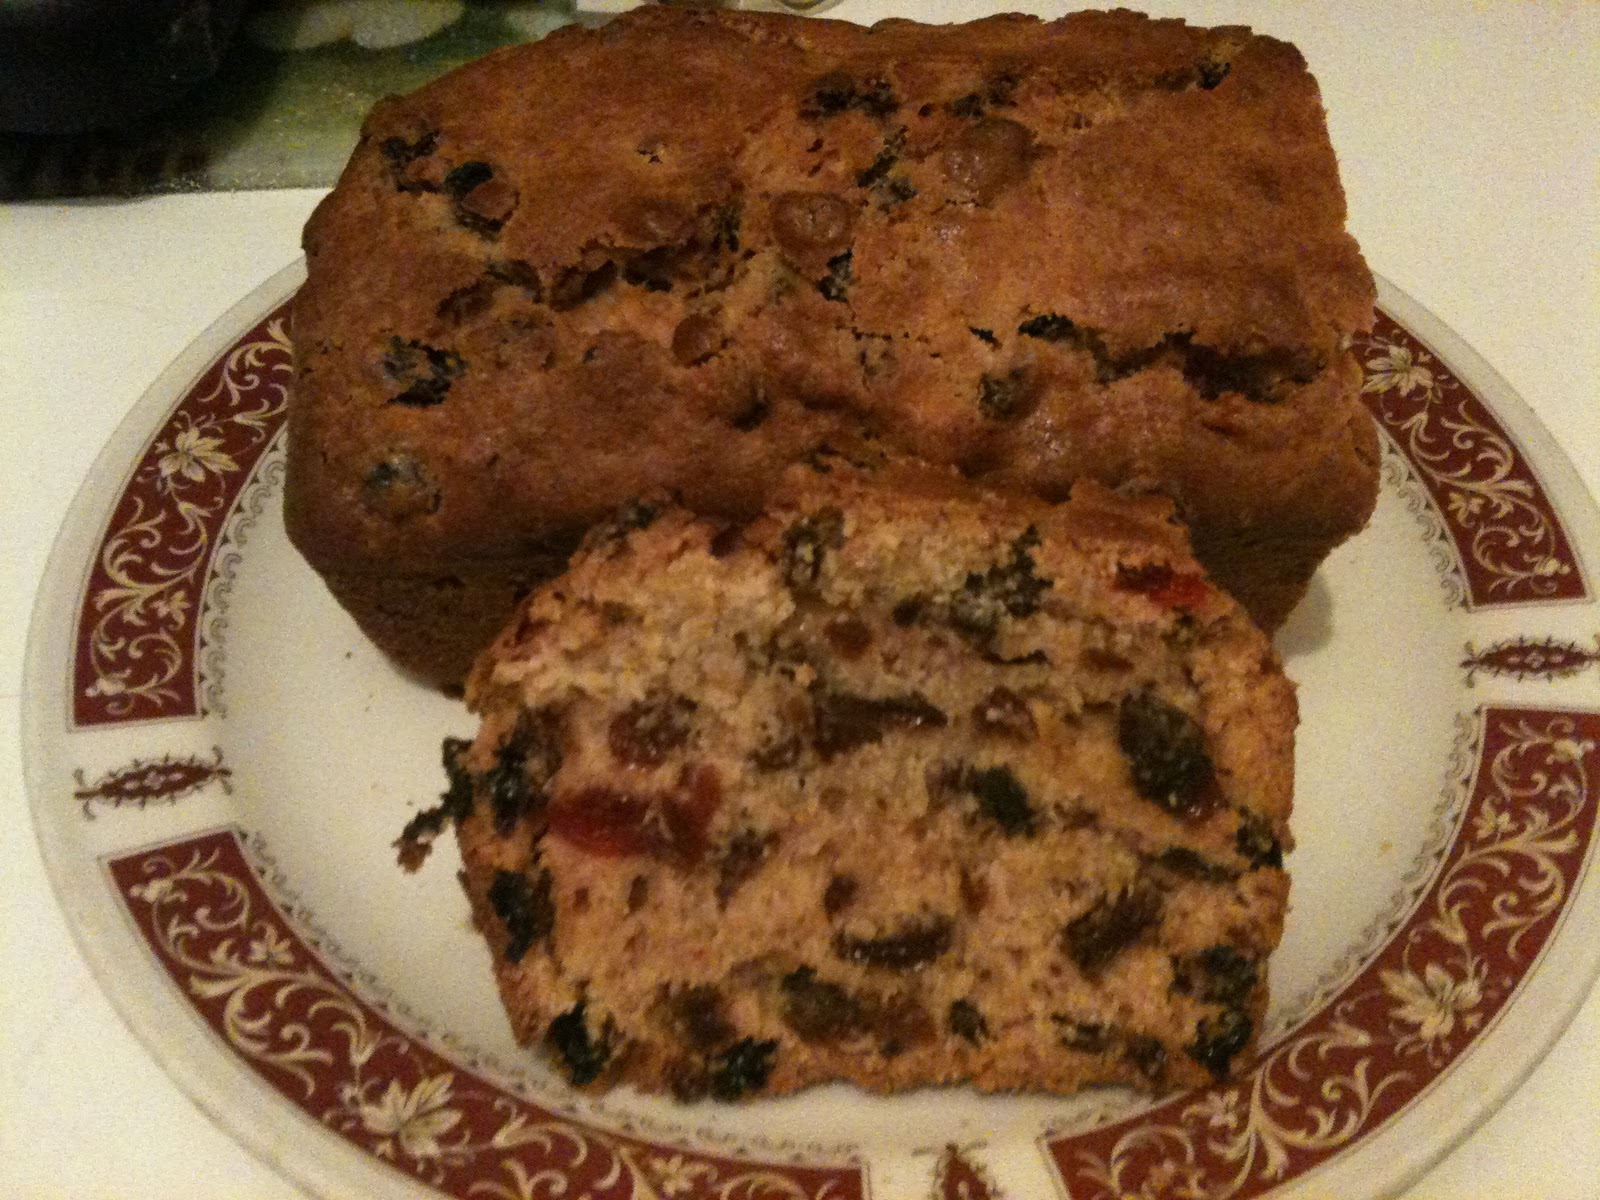 Fruit Cake Recipe Loaf Pan: Nicole's Cakes: Boiled Fruit Cake